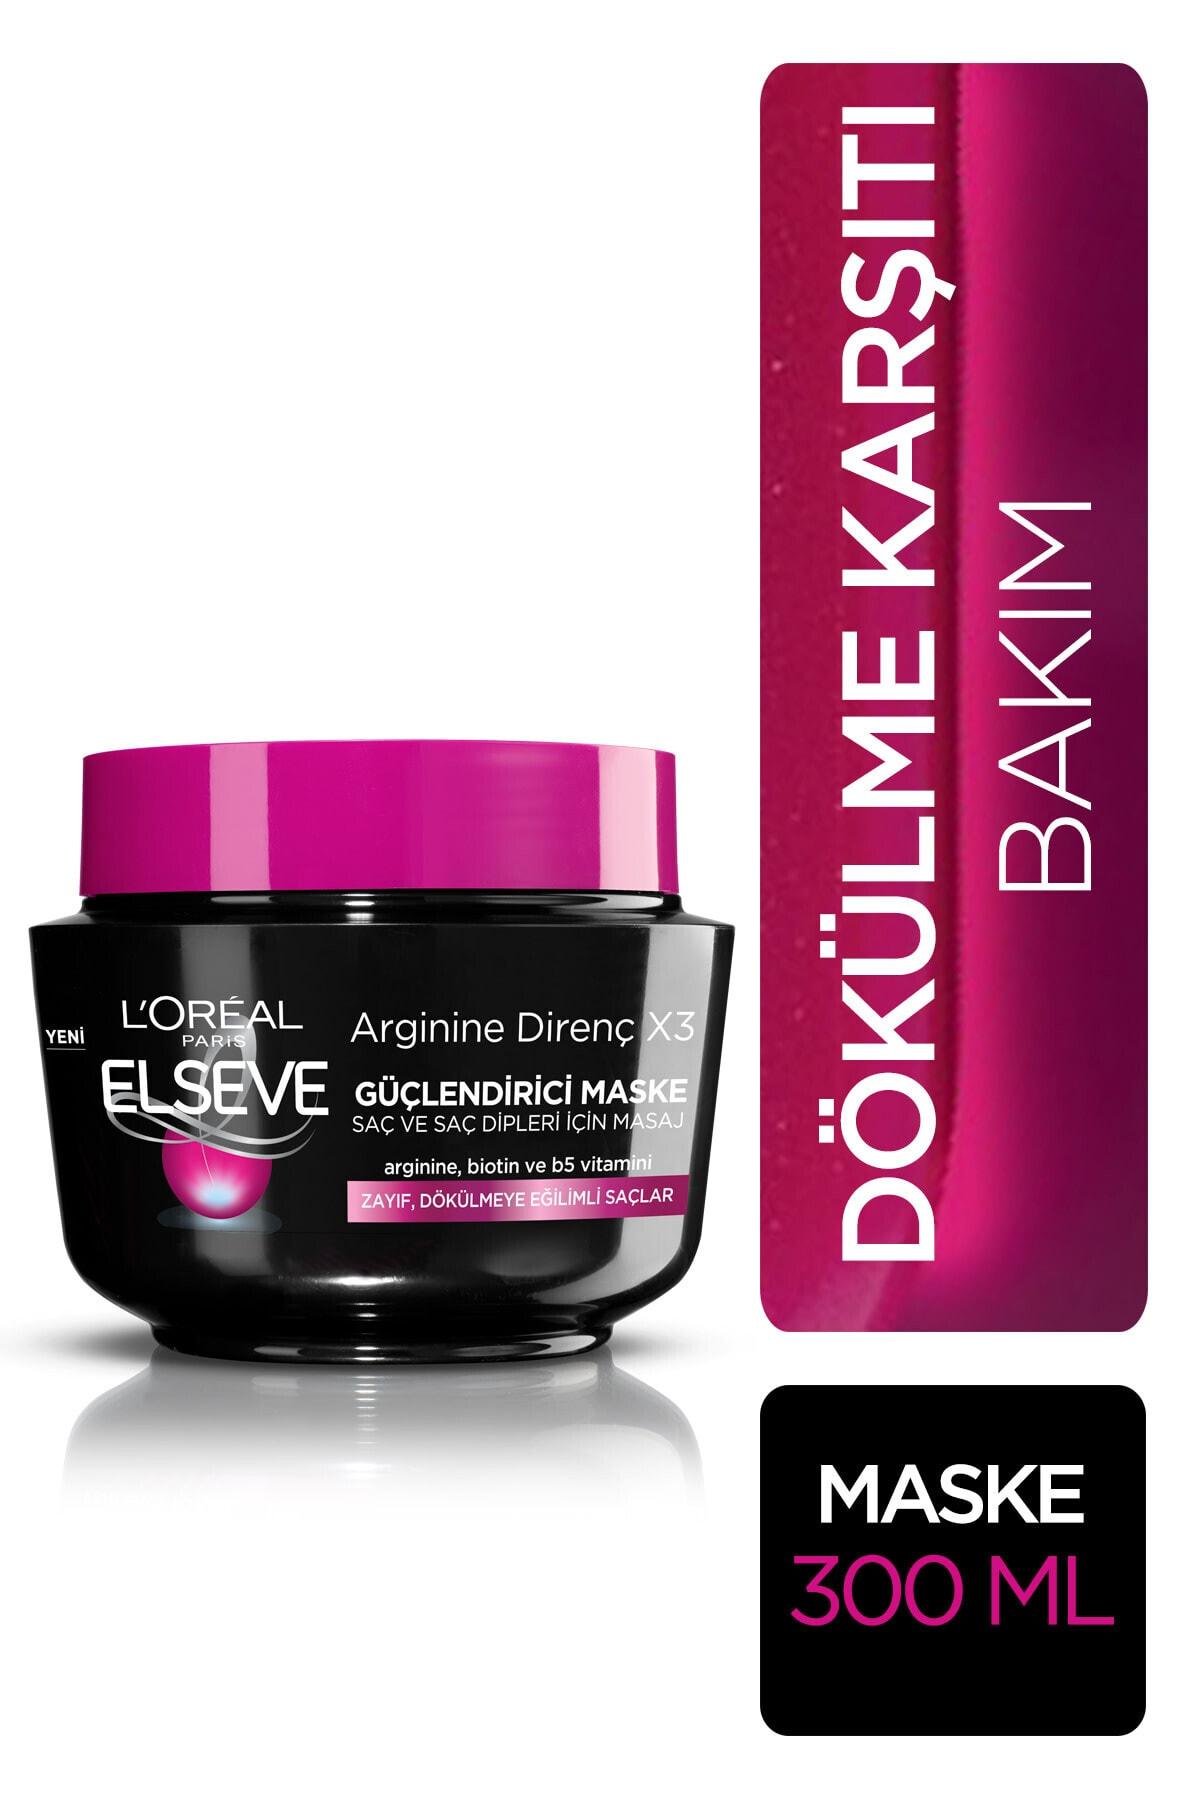 ELSEVE L'oréal Paris Arginine Direnç Dökülme Karşıtı Maske 300 ml 2